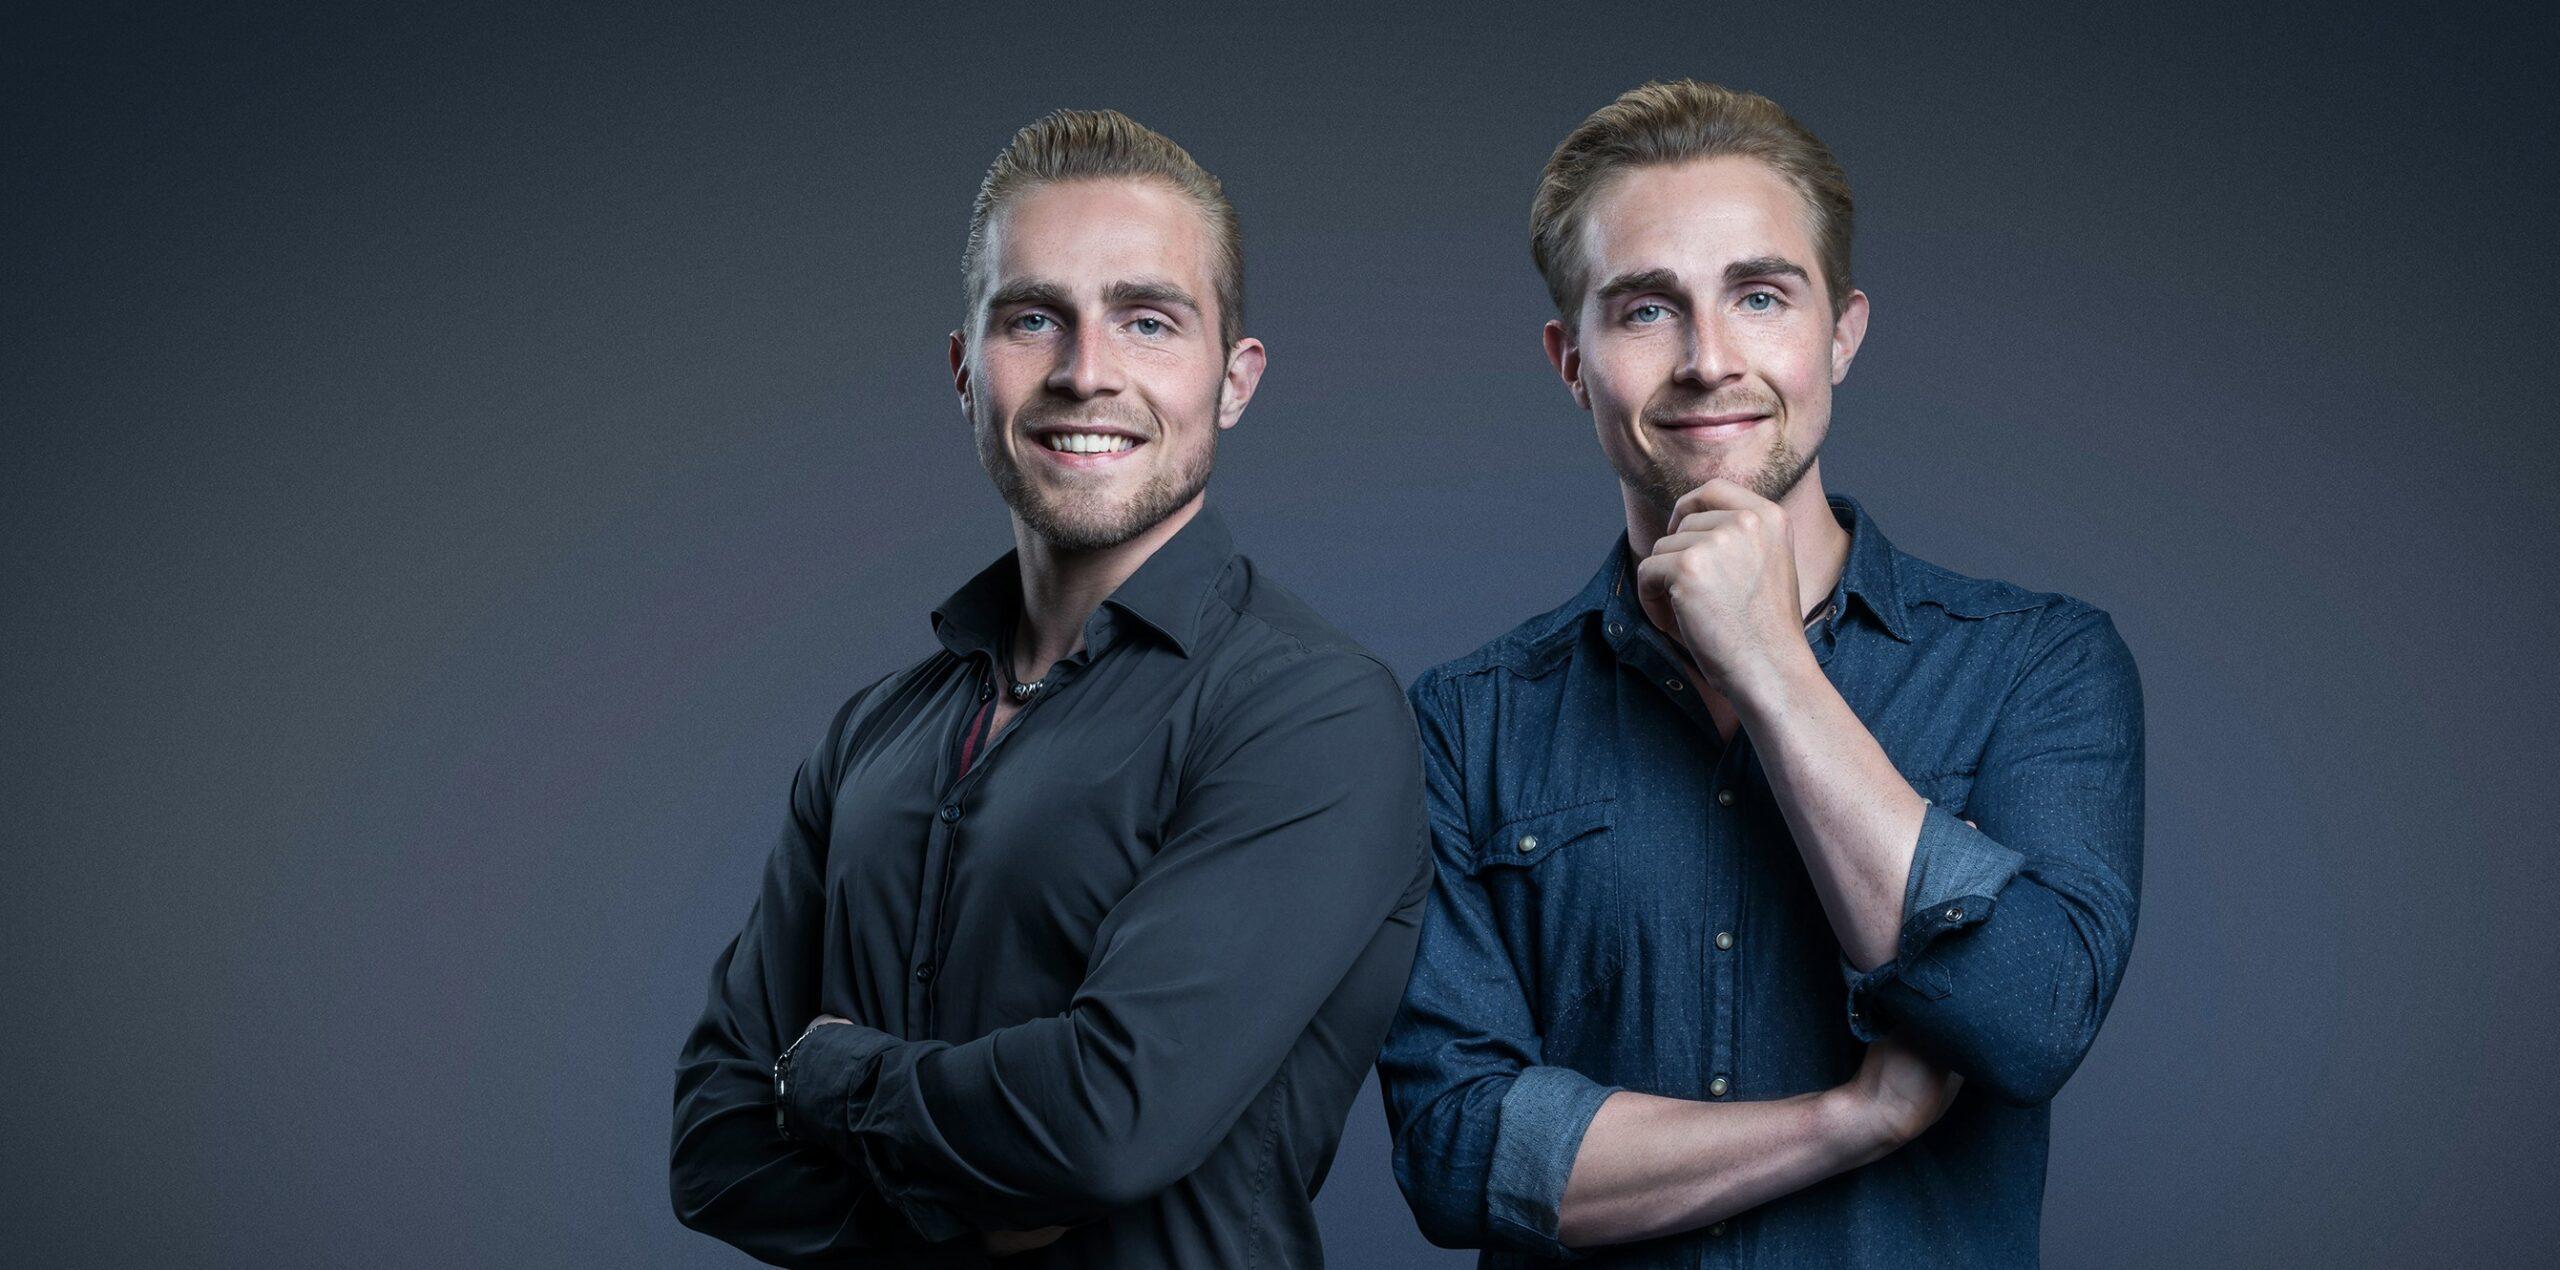 NOX BROTHERS - Team